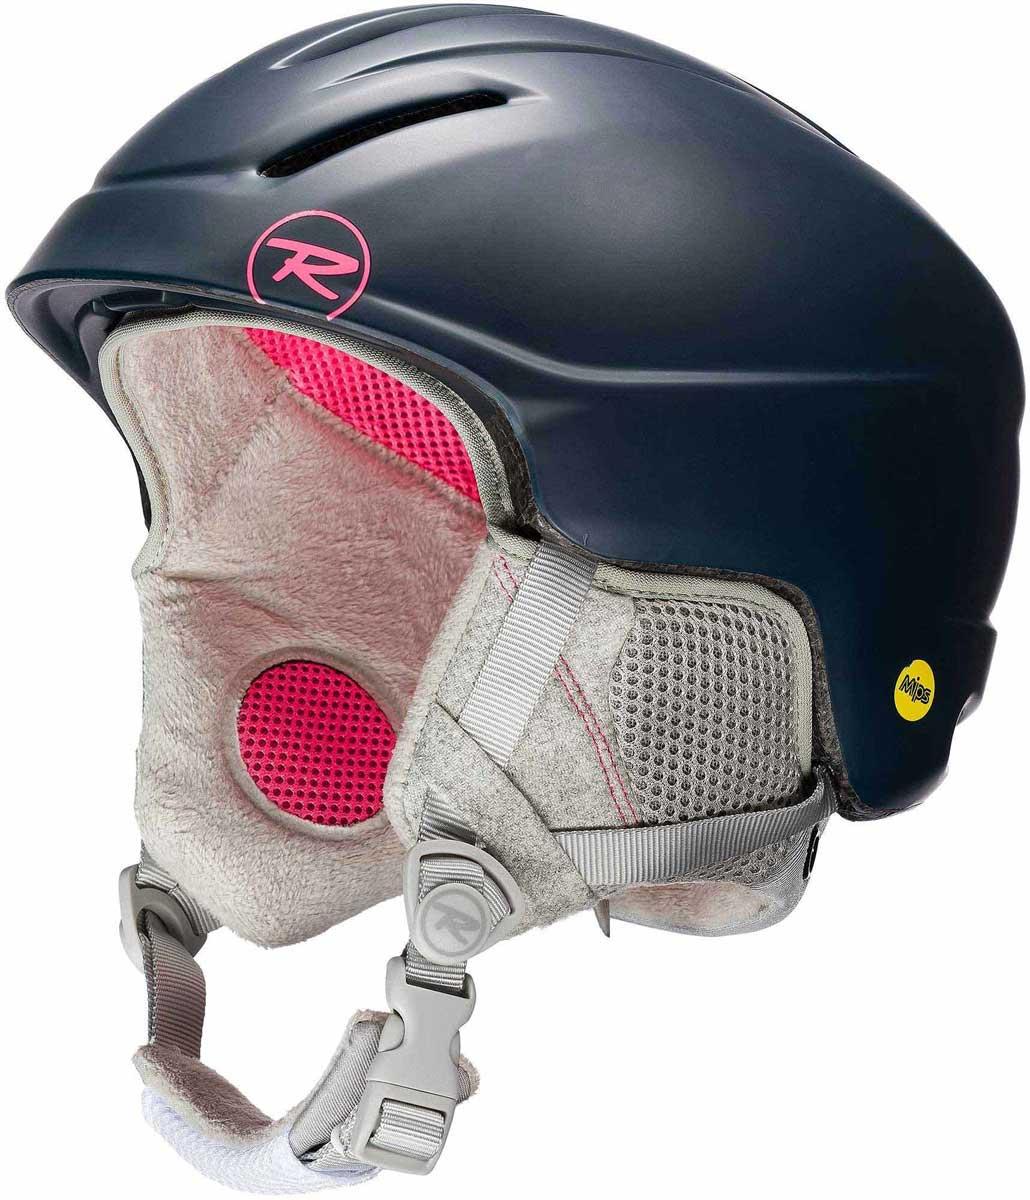 ROSSIGNOL(ロシニョール) RKHH401 RH2 W MIPS レディース スノーヘルメット スキー スノーボード